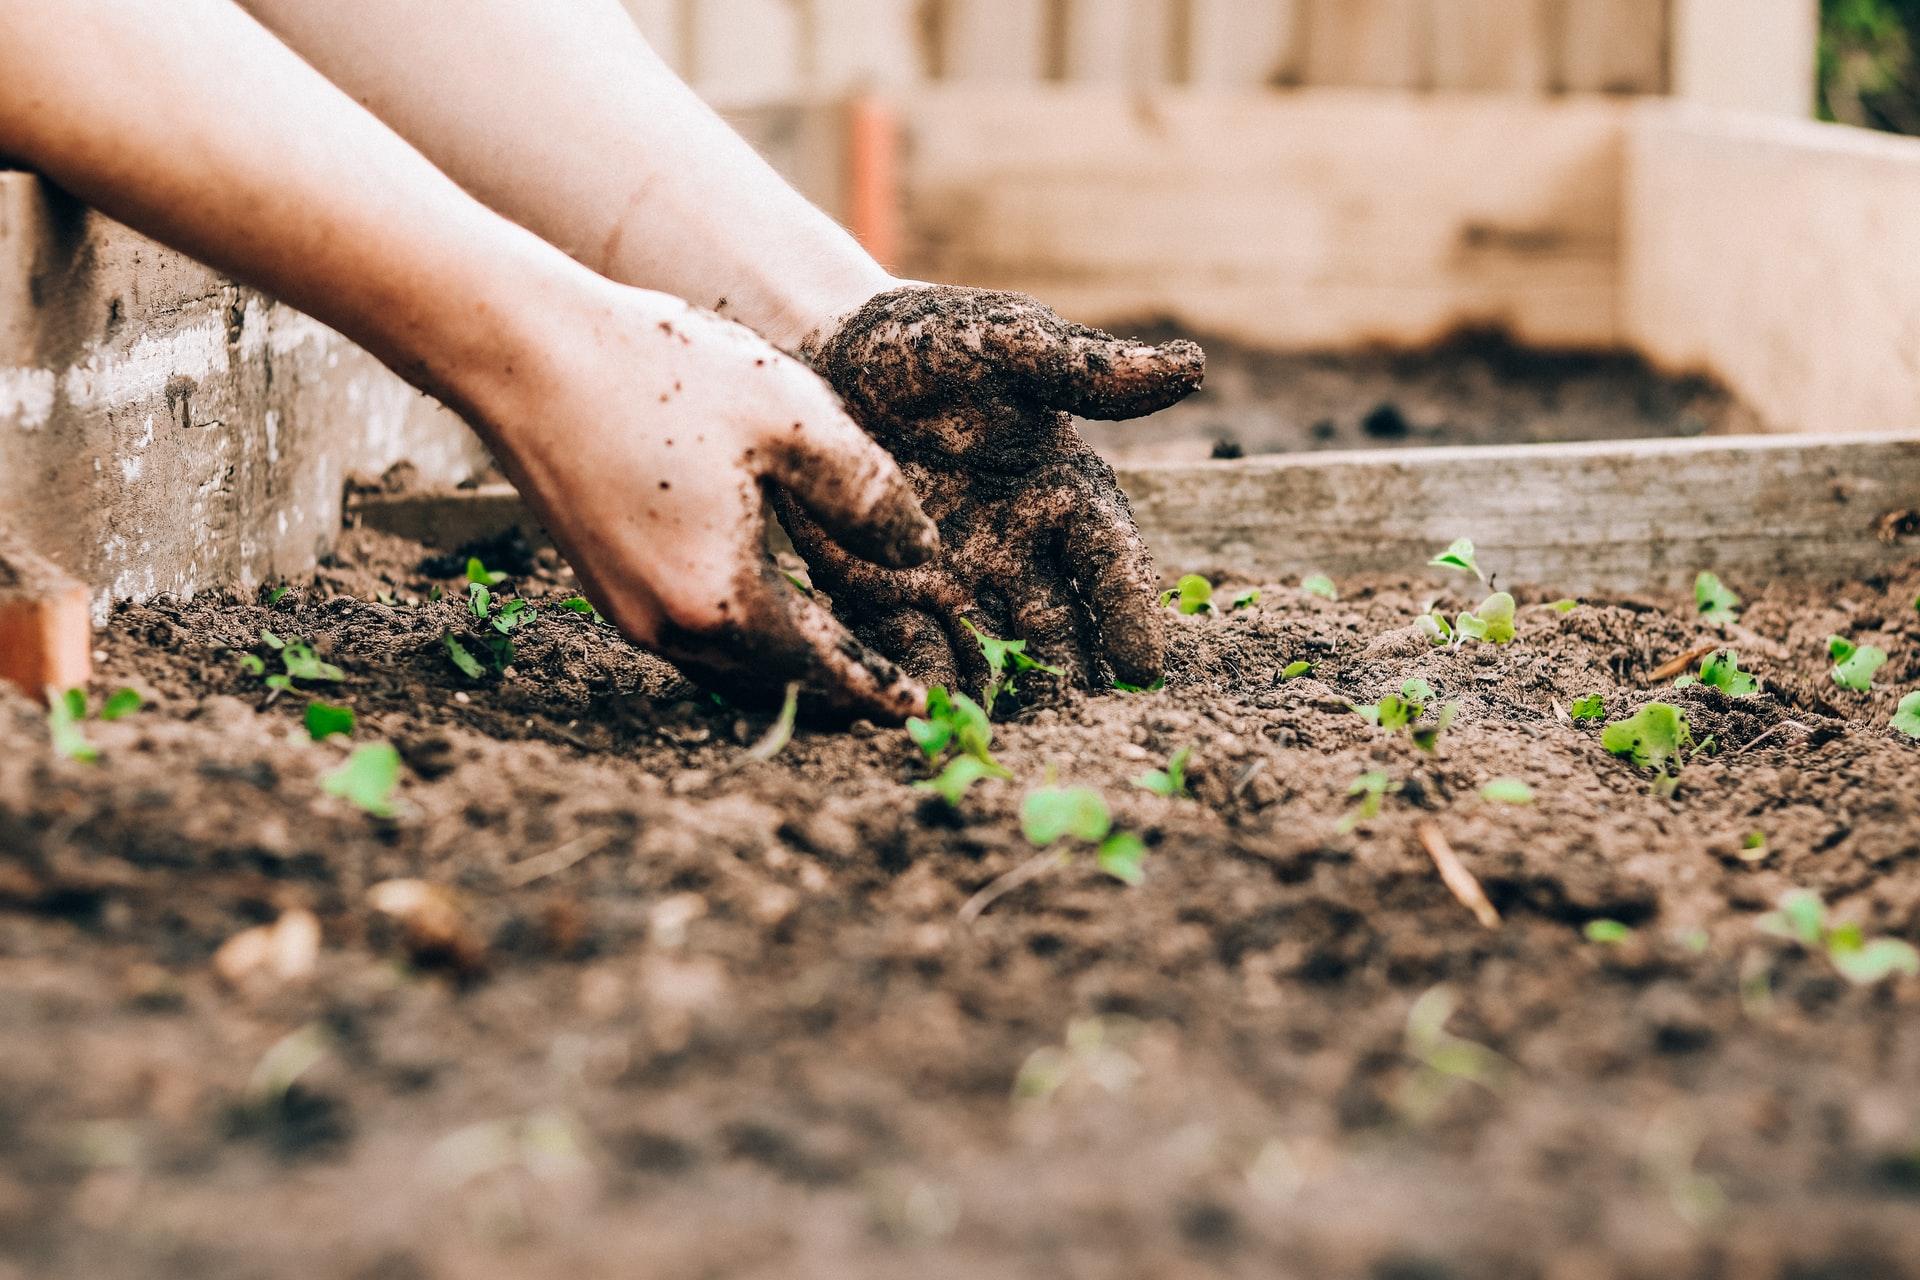 5 Simple Ways To Find Vegetable Garden Ideas & Inspiration